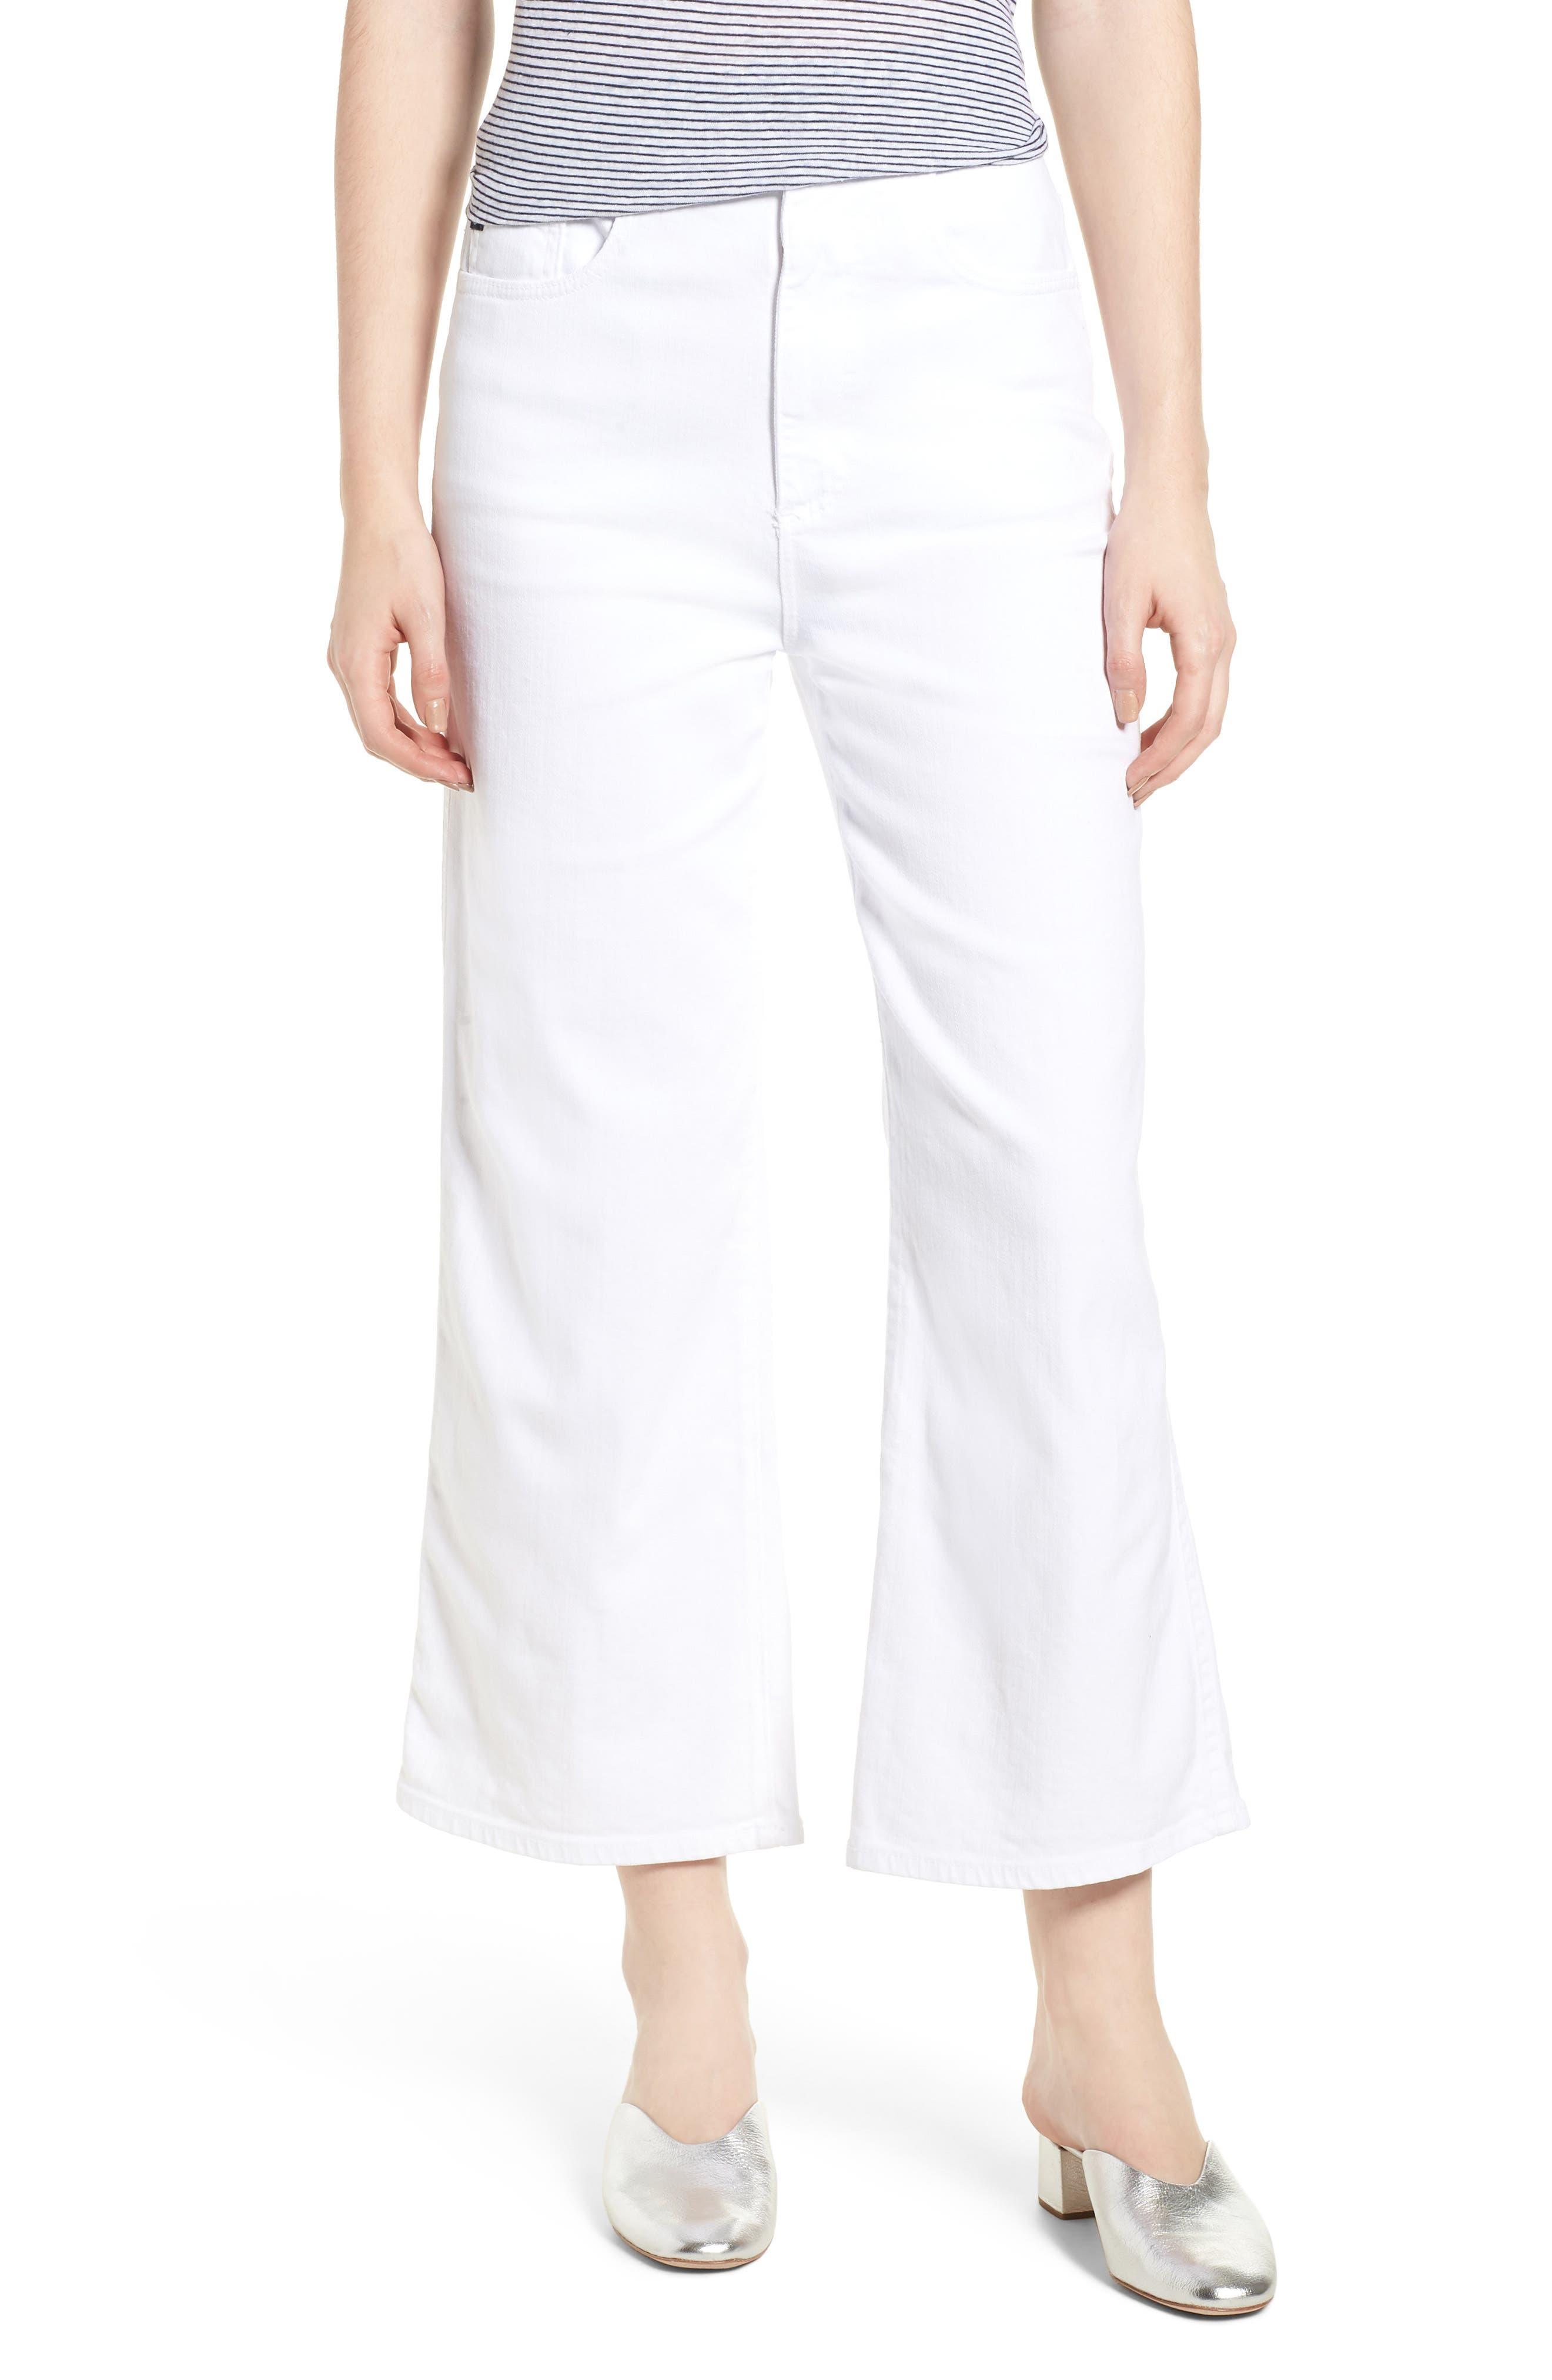 Etta High Waist Crop Wide Leg Jeans,                         Main,                         color, White